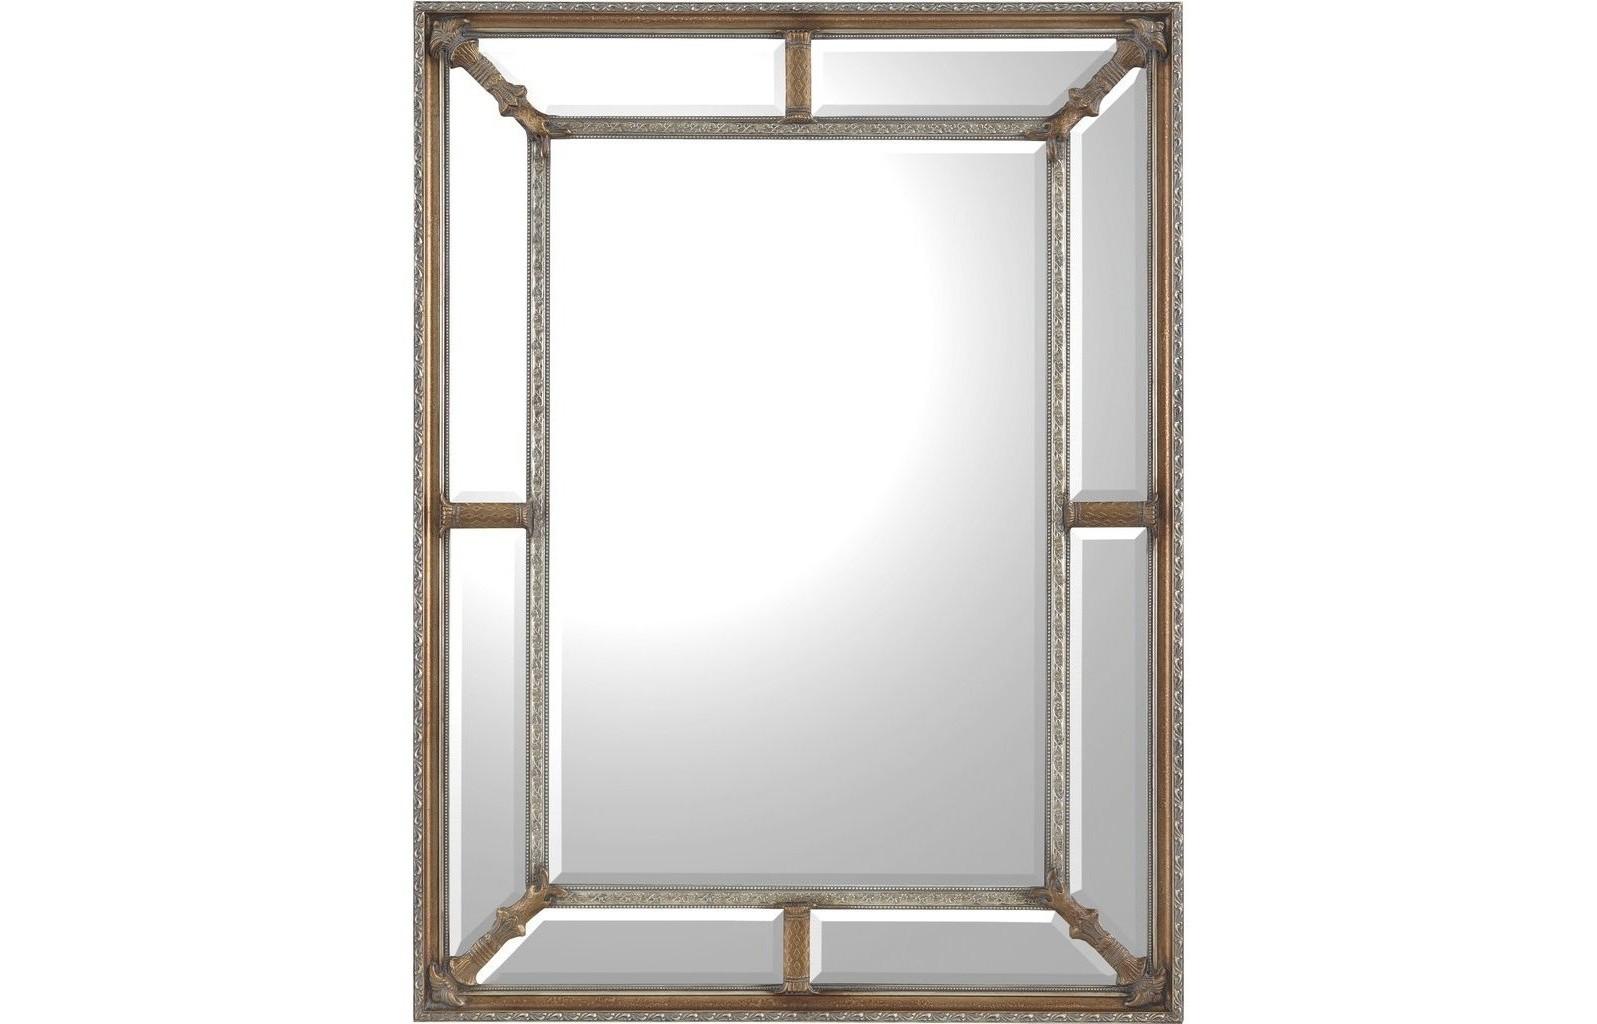 Зеркало в раме ГарриНастенные зеркала<br><br><br>Material: Дерево<br>Width см: 90<br>Depth см: 3<br>Height см: 122